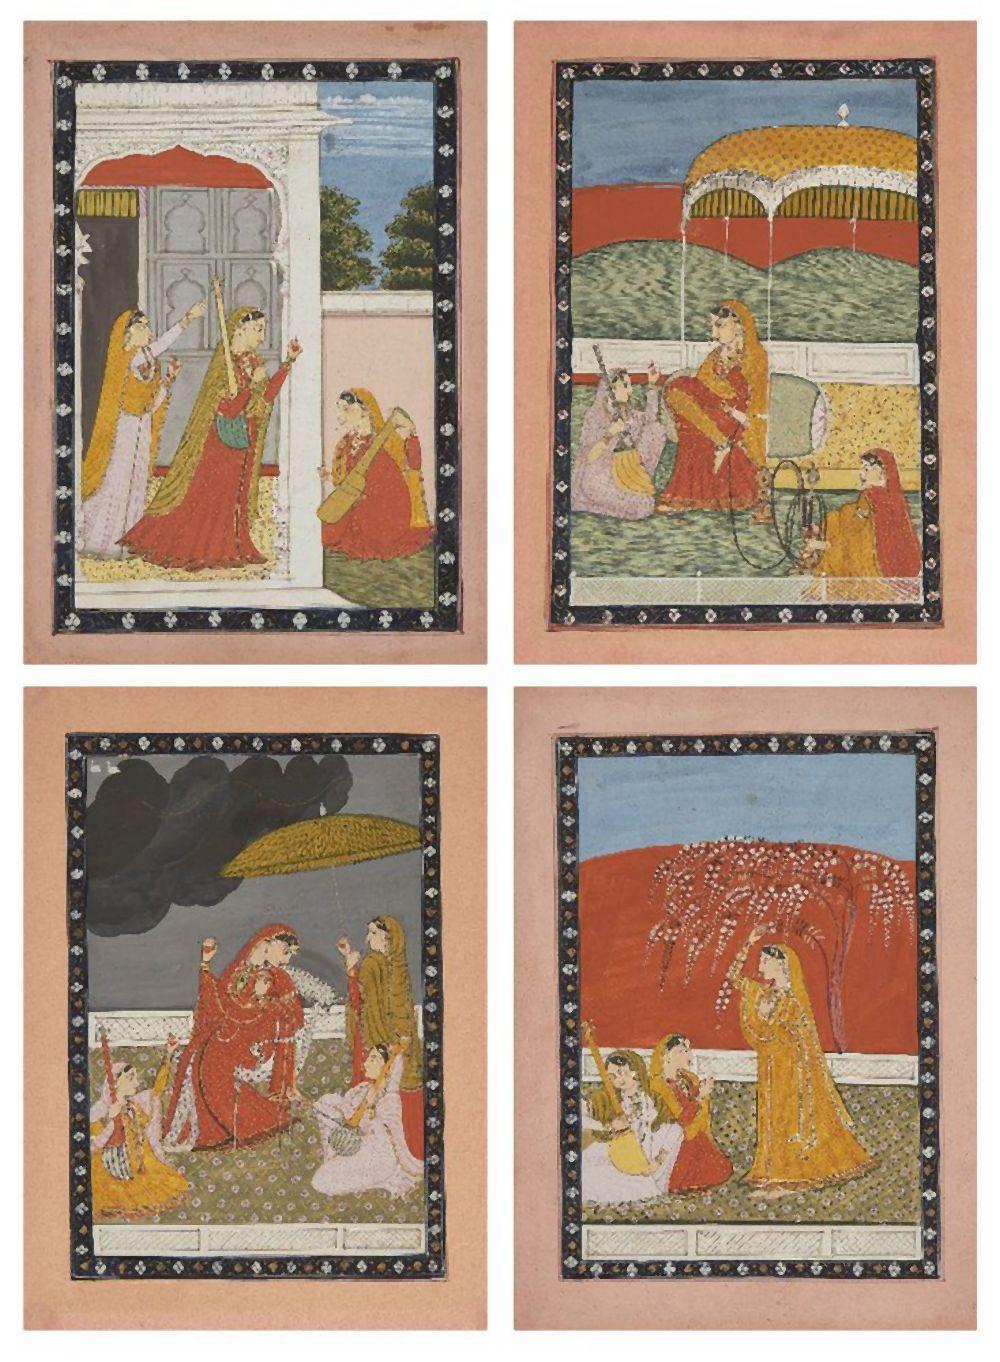 Four illustrations from a Ragamala Series: Pahari region, probably Garhwal,